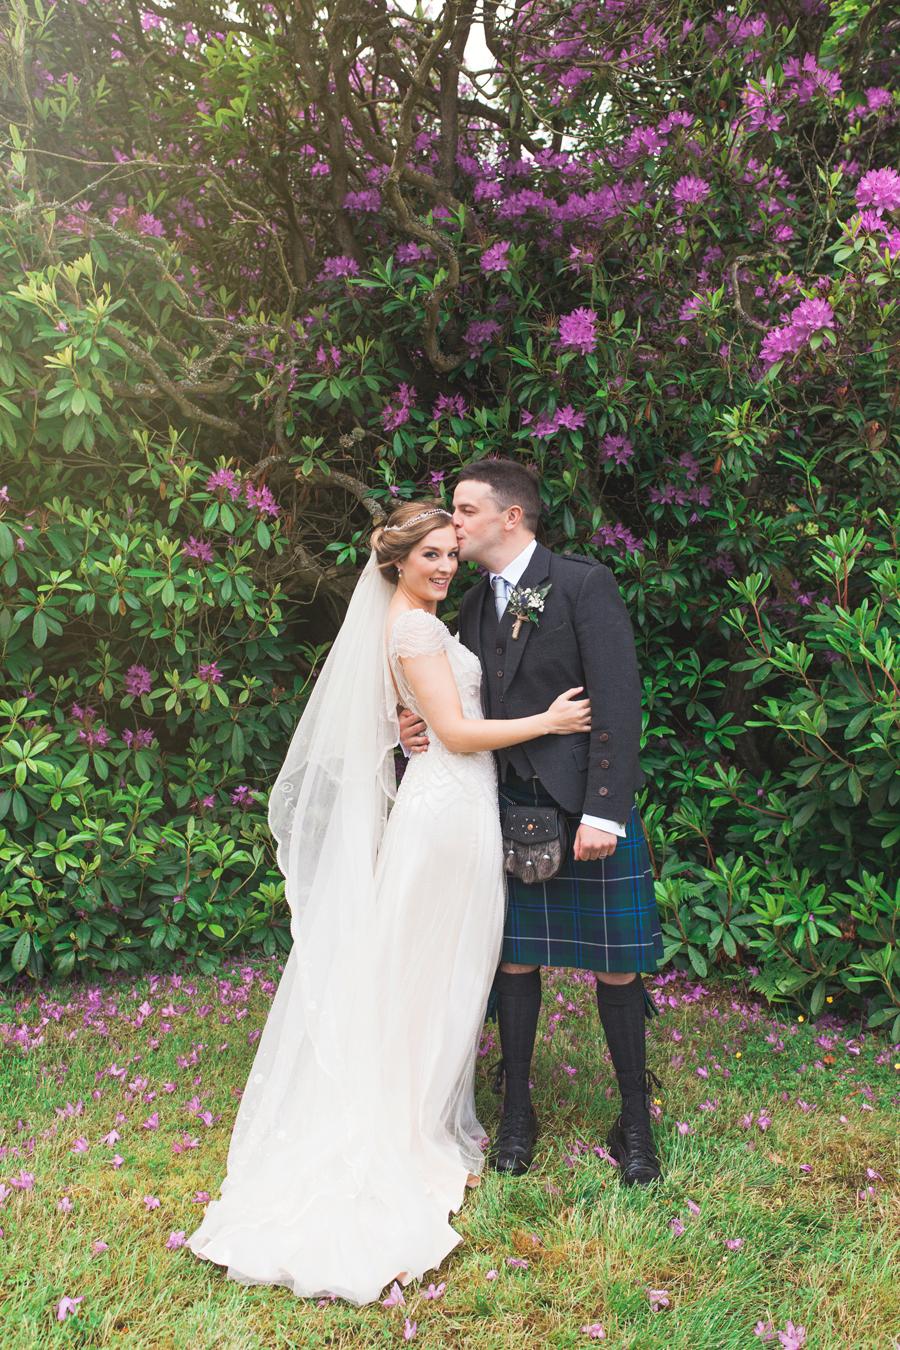 023-edinburgh-wedding-photography.jpg